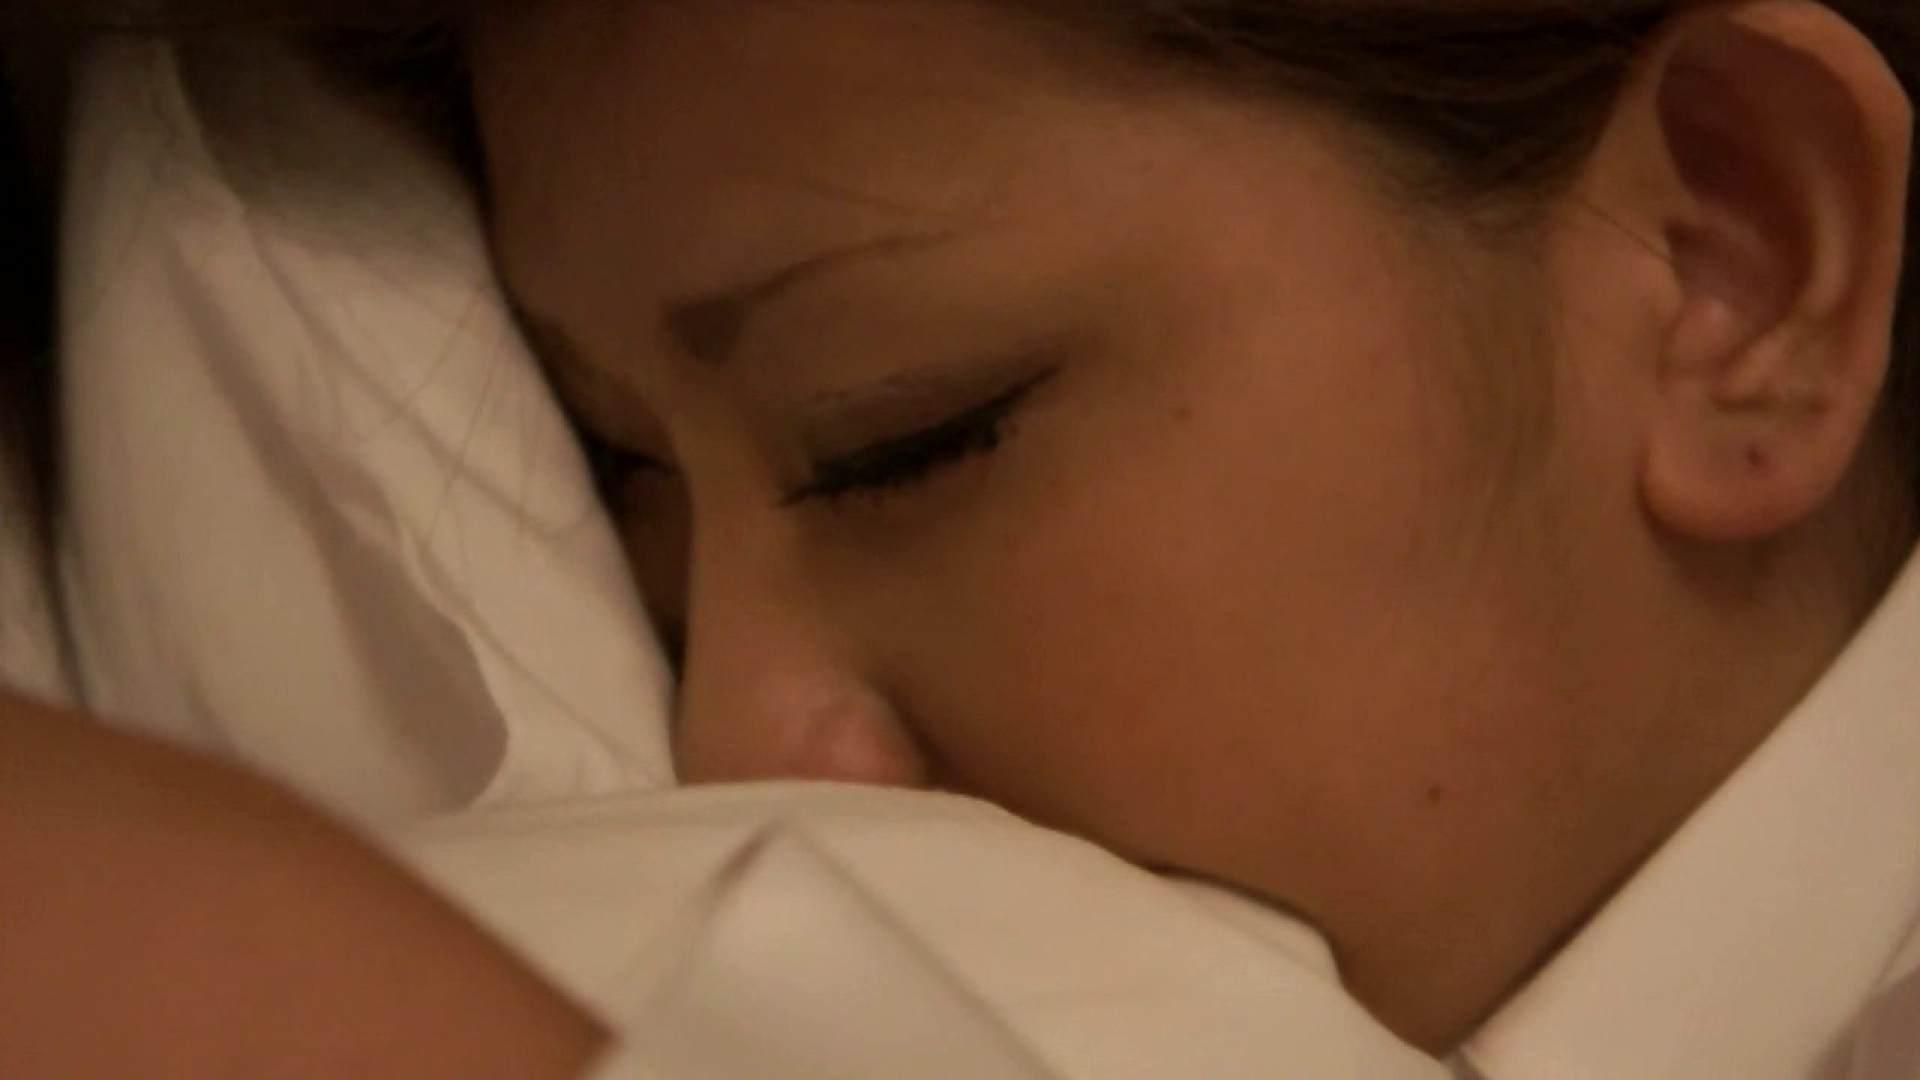 vol.8 【Mちゃん(2回目)】ブランド品査定士19歳 花子とも仲良し キャバ嬢 | 友人・知人  41画像 1